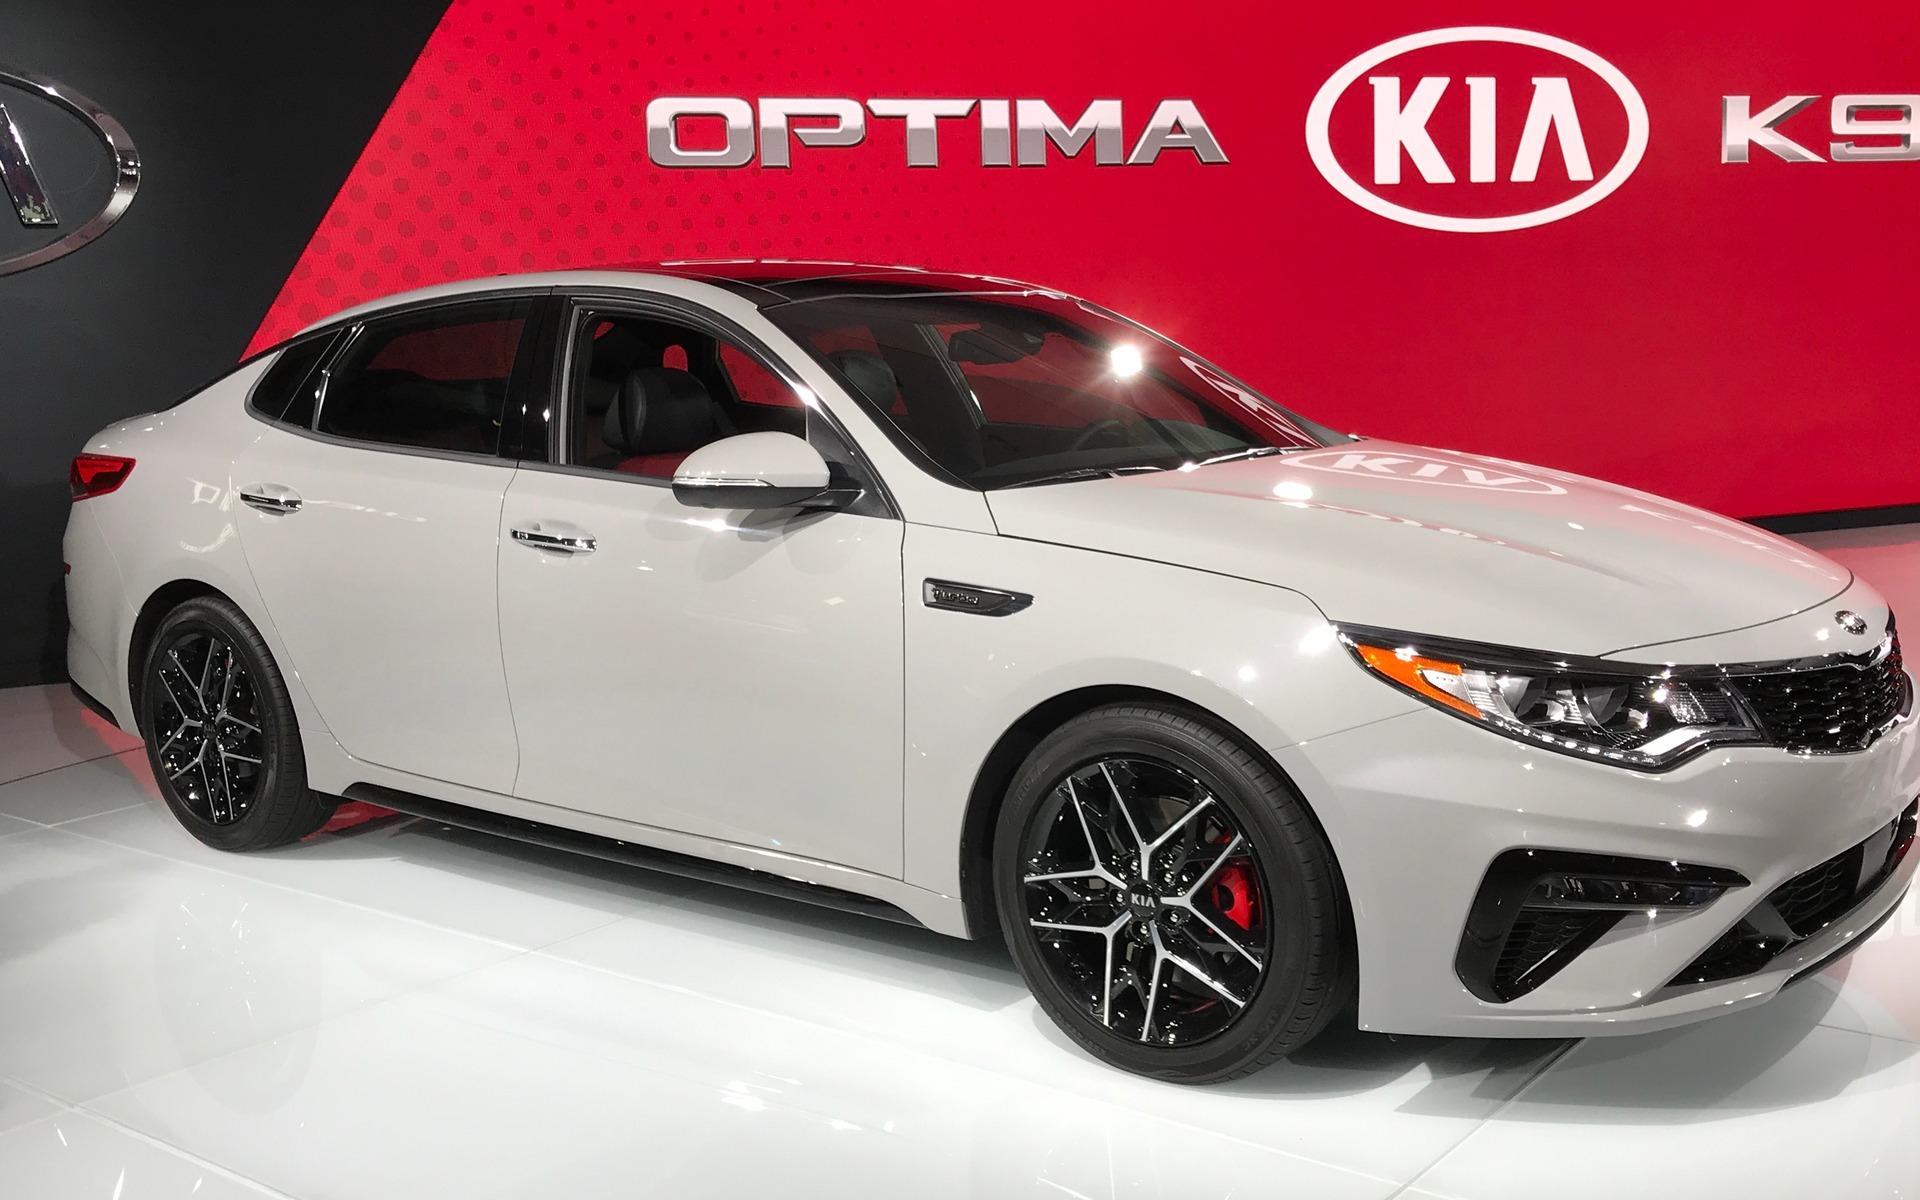 La toute nouvelle Kia Optima 2019